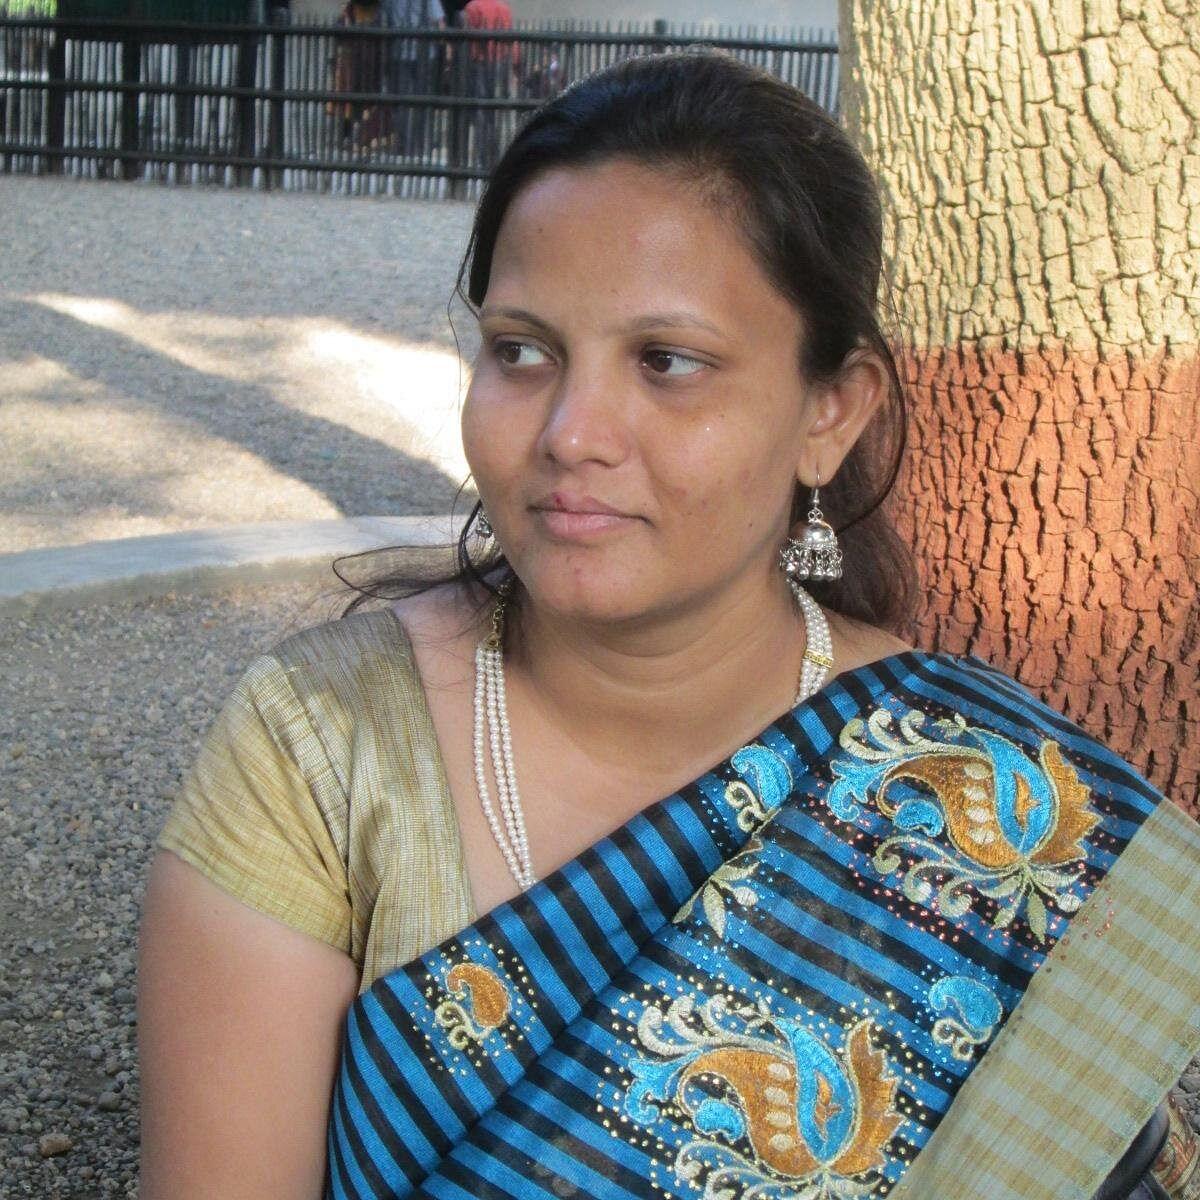 Priya Wal,Melinda Shankar Hot photo Diane Hart,Eileen McCallum (born 1936)